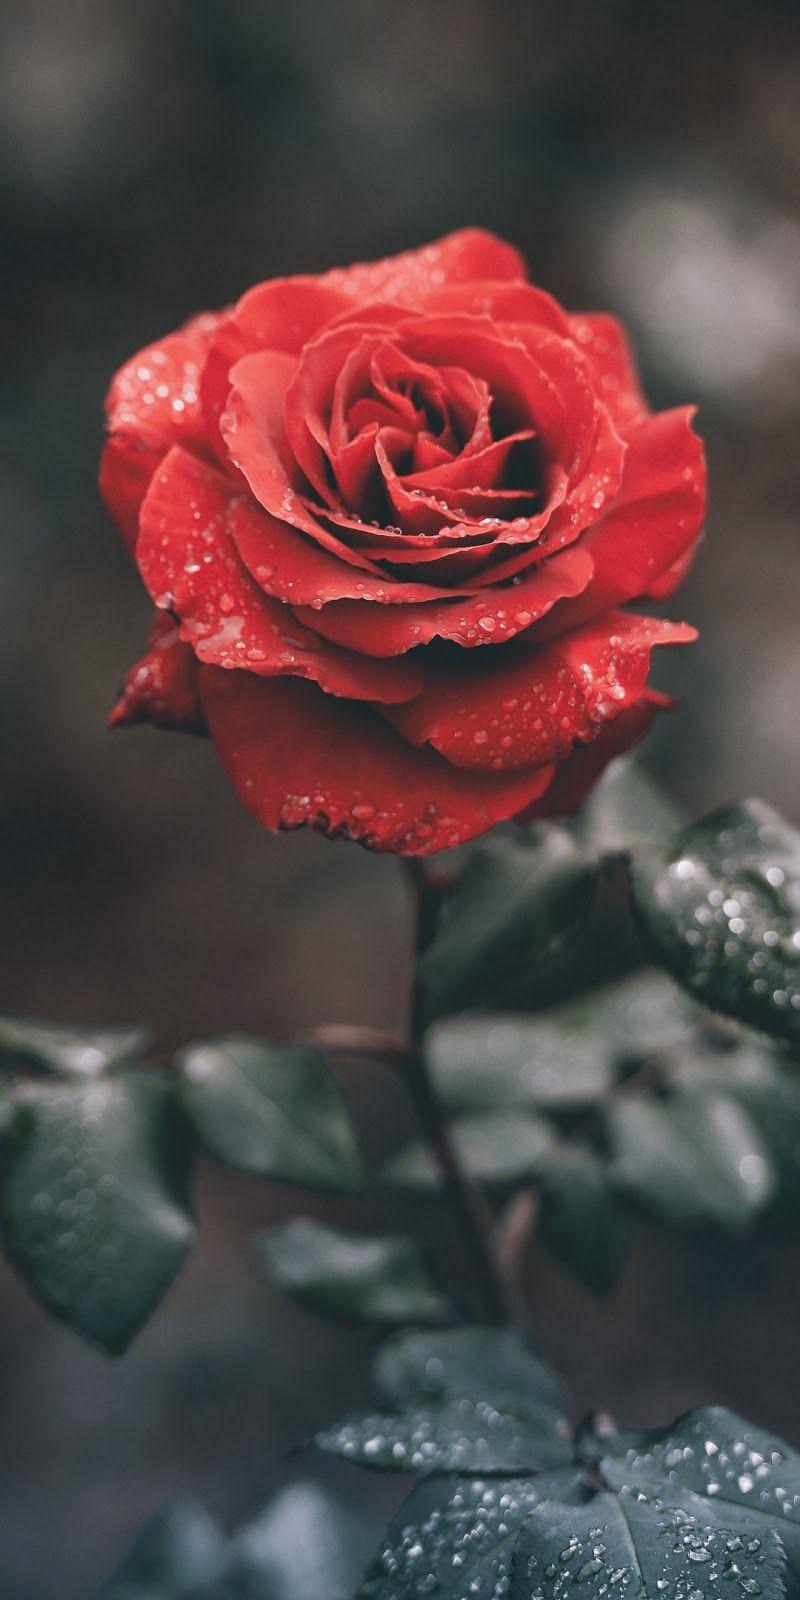 Pin By Itsg1va Ananthavel On Florzinhas Red Roses Wallpaper Wallpaper Iphone Roses Flower Phone Wallpaper